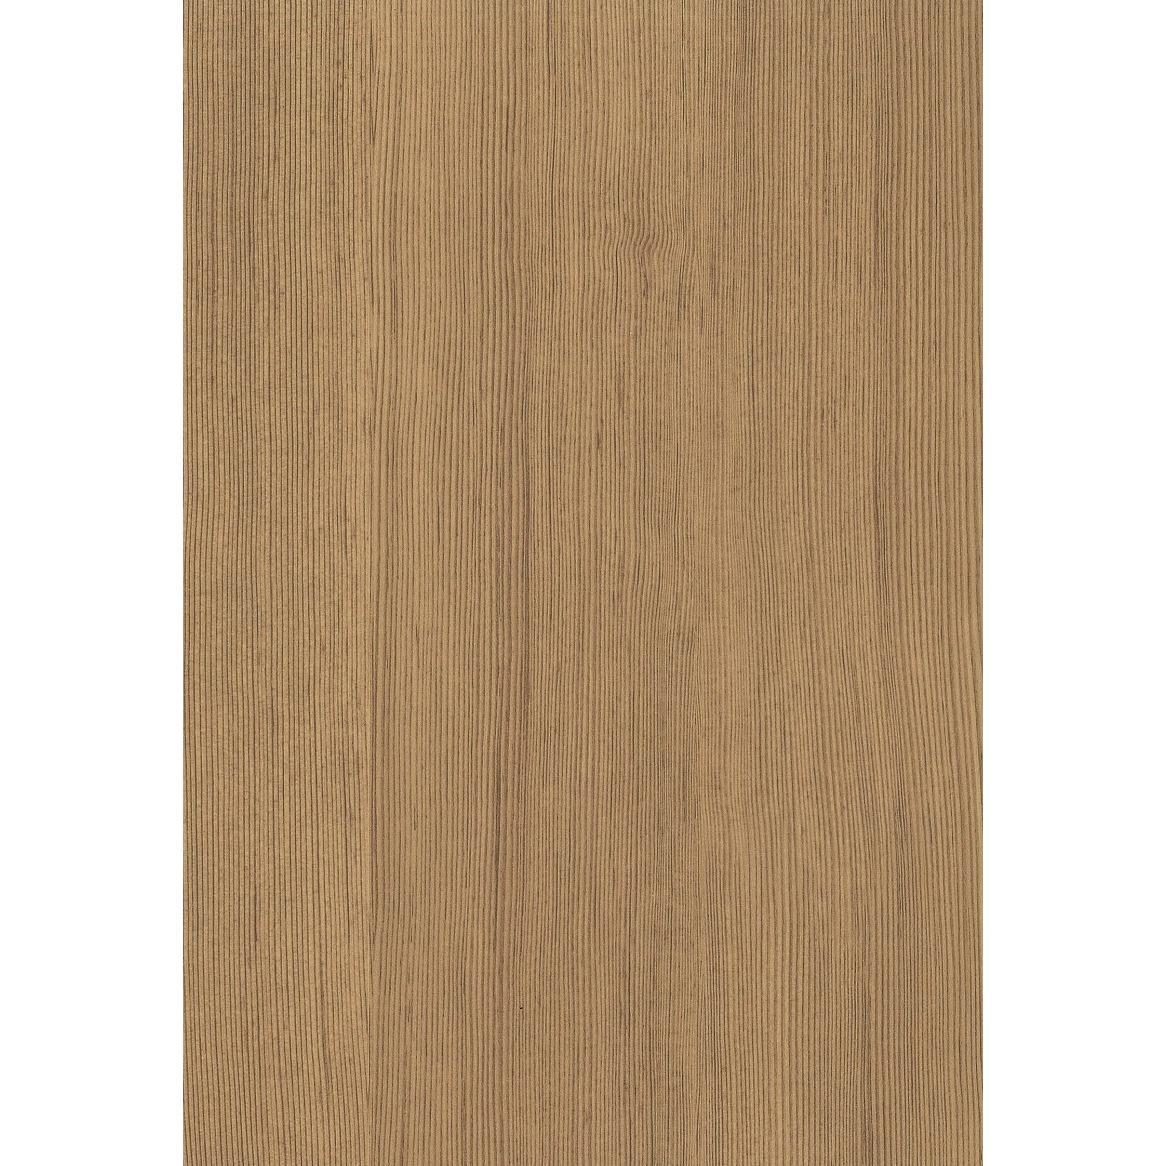 WOL - Laminate 4 x 8 thickness 0.8mm Sheets - Congo Zebrana - HPL